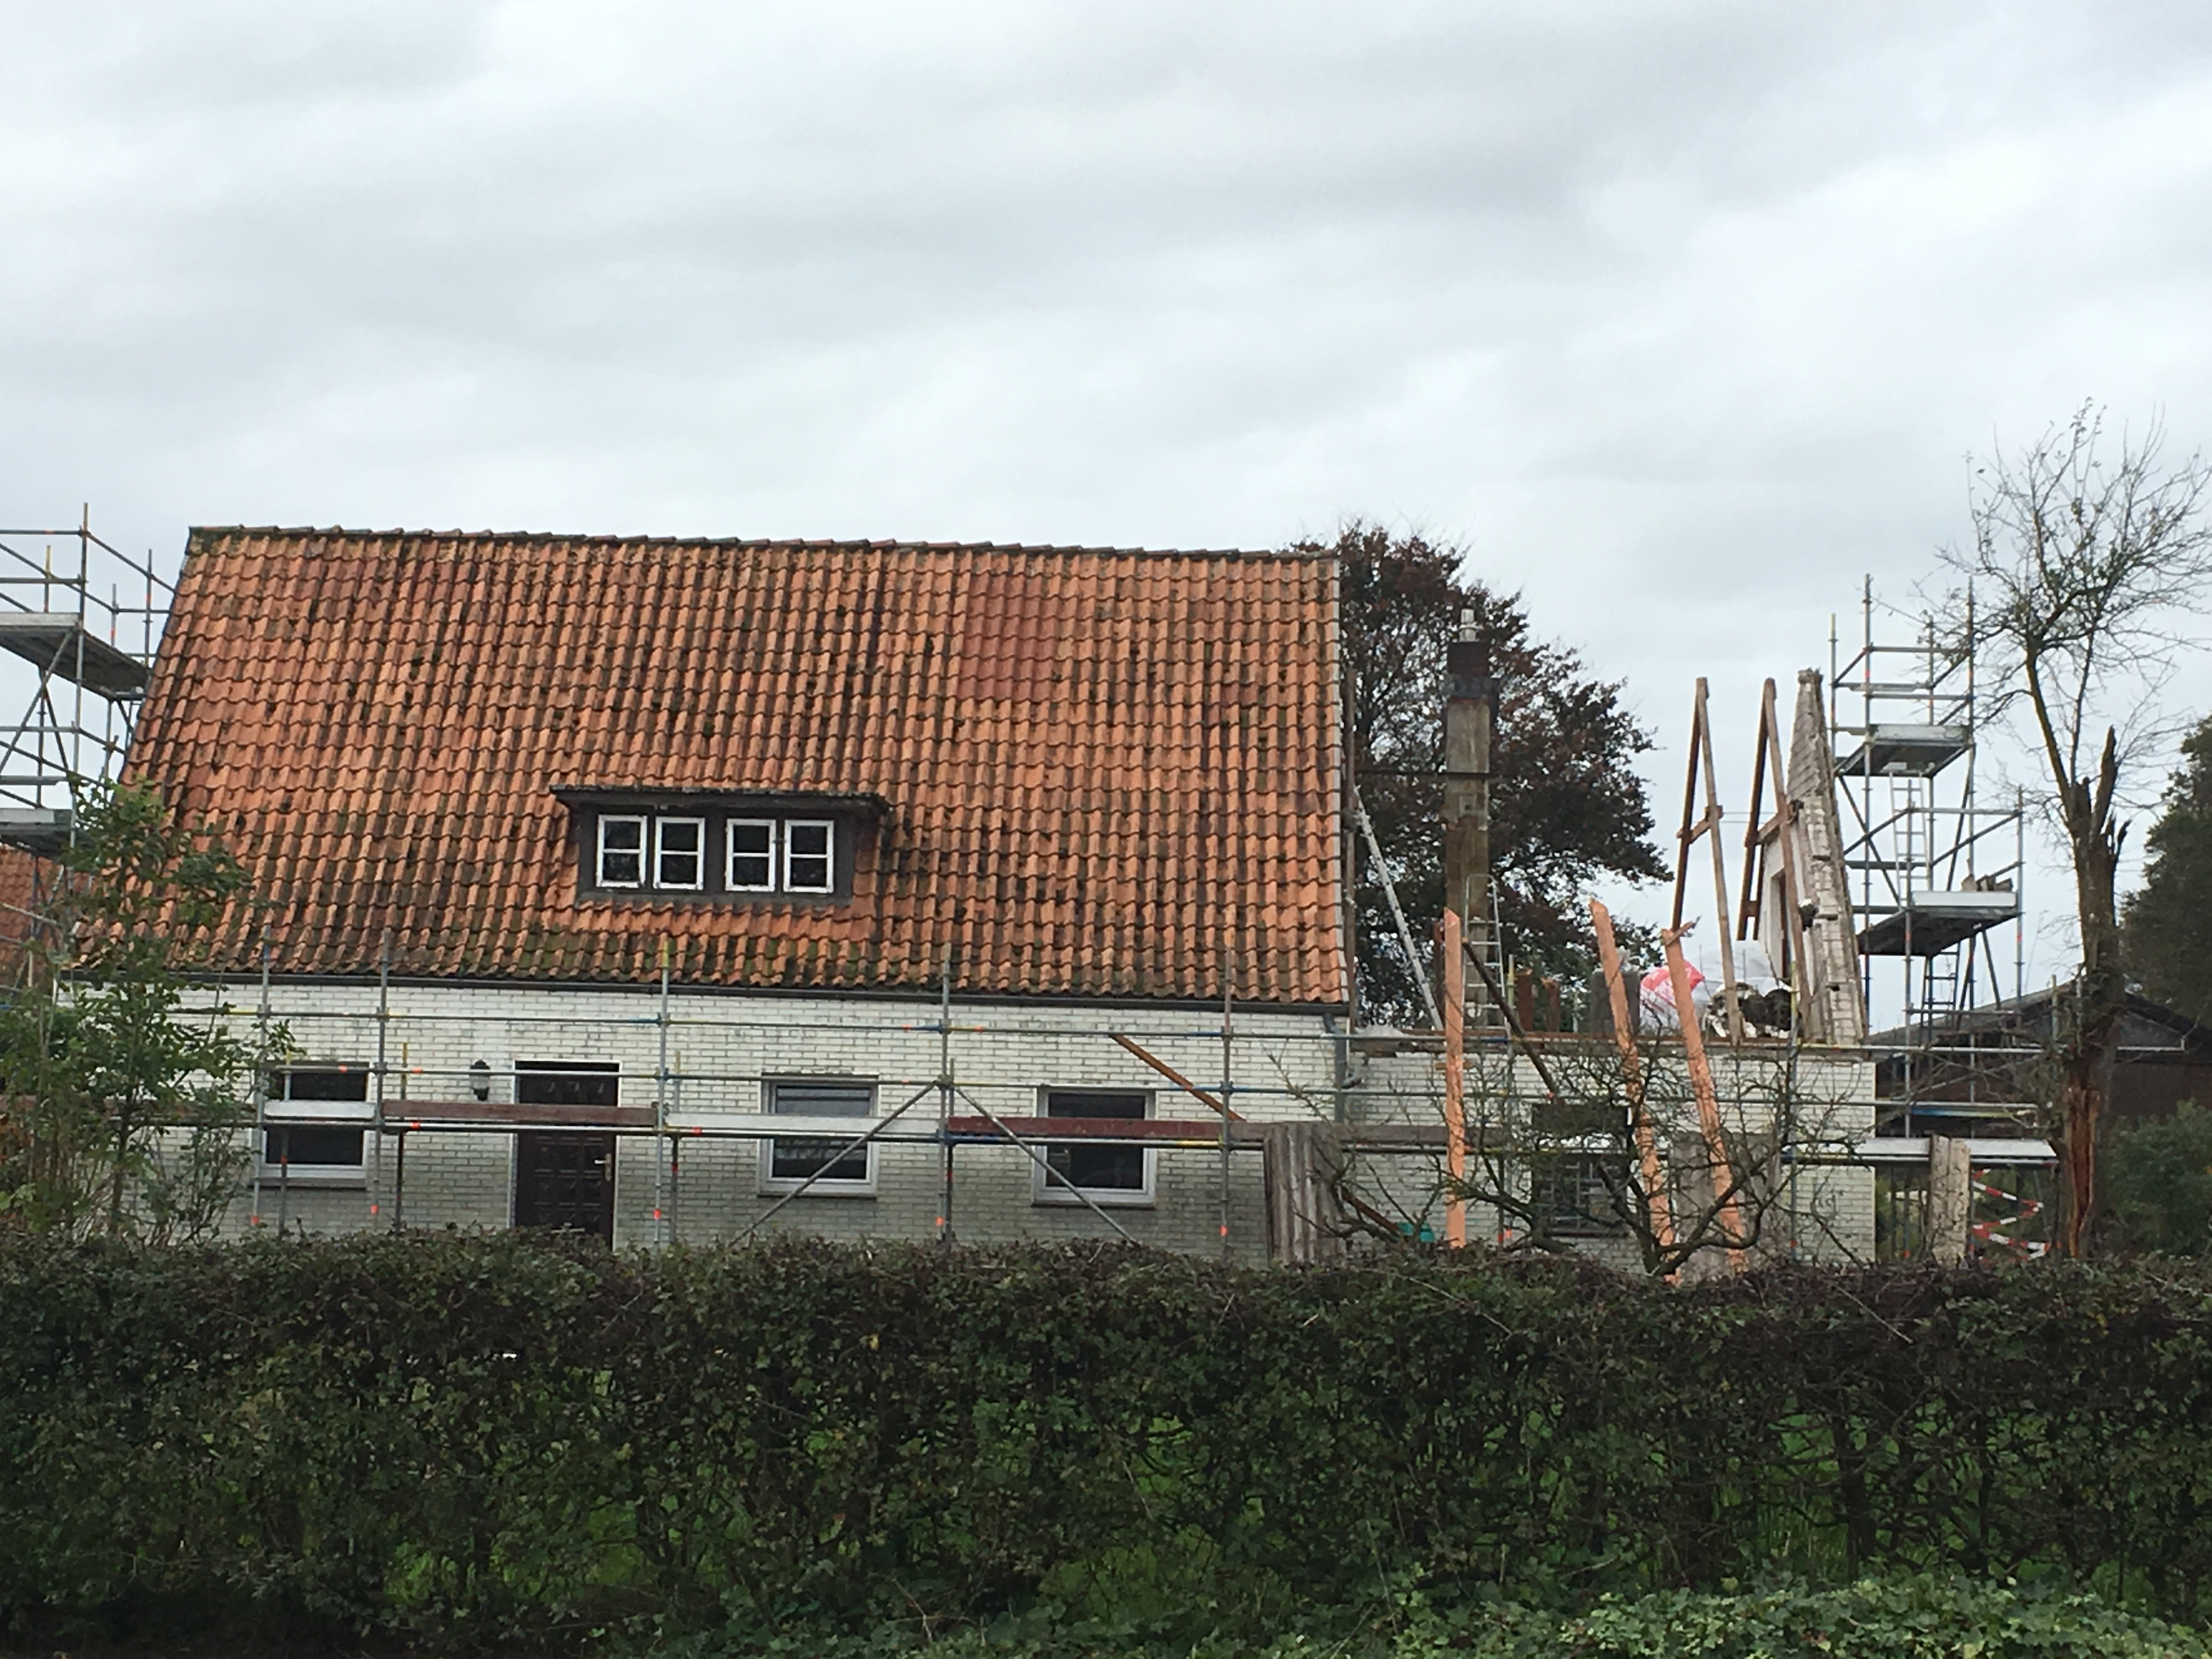 Erneuerung des Dachstuhls am Anbau